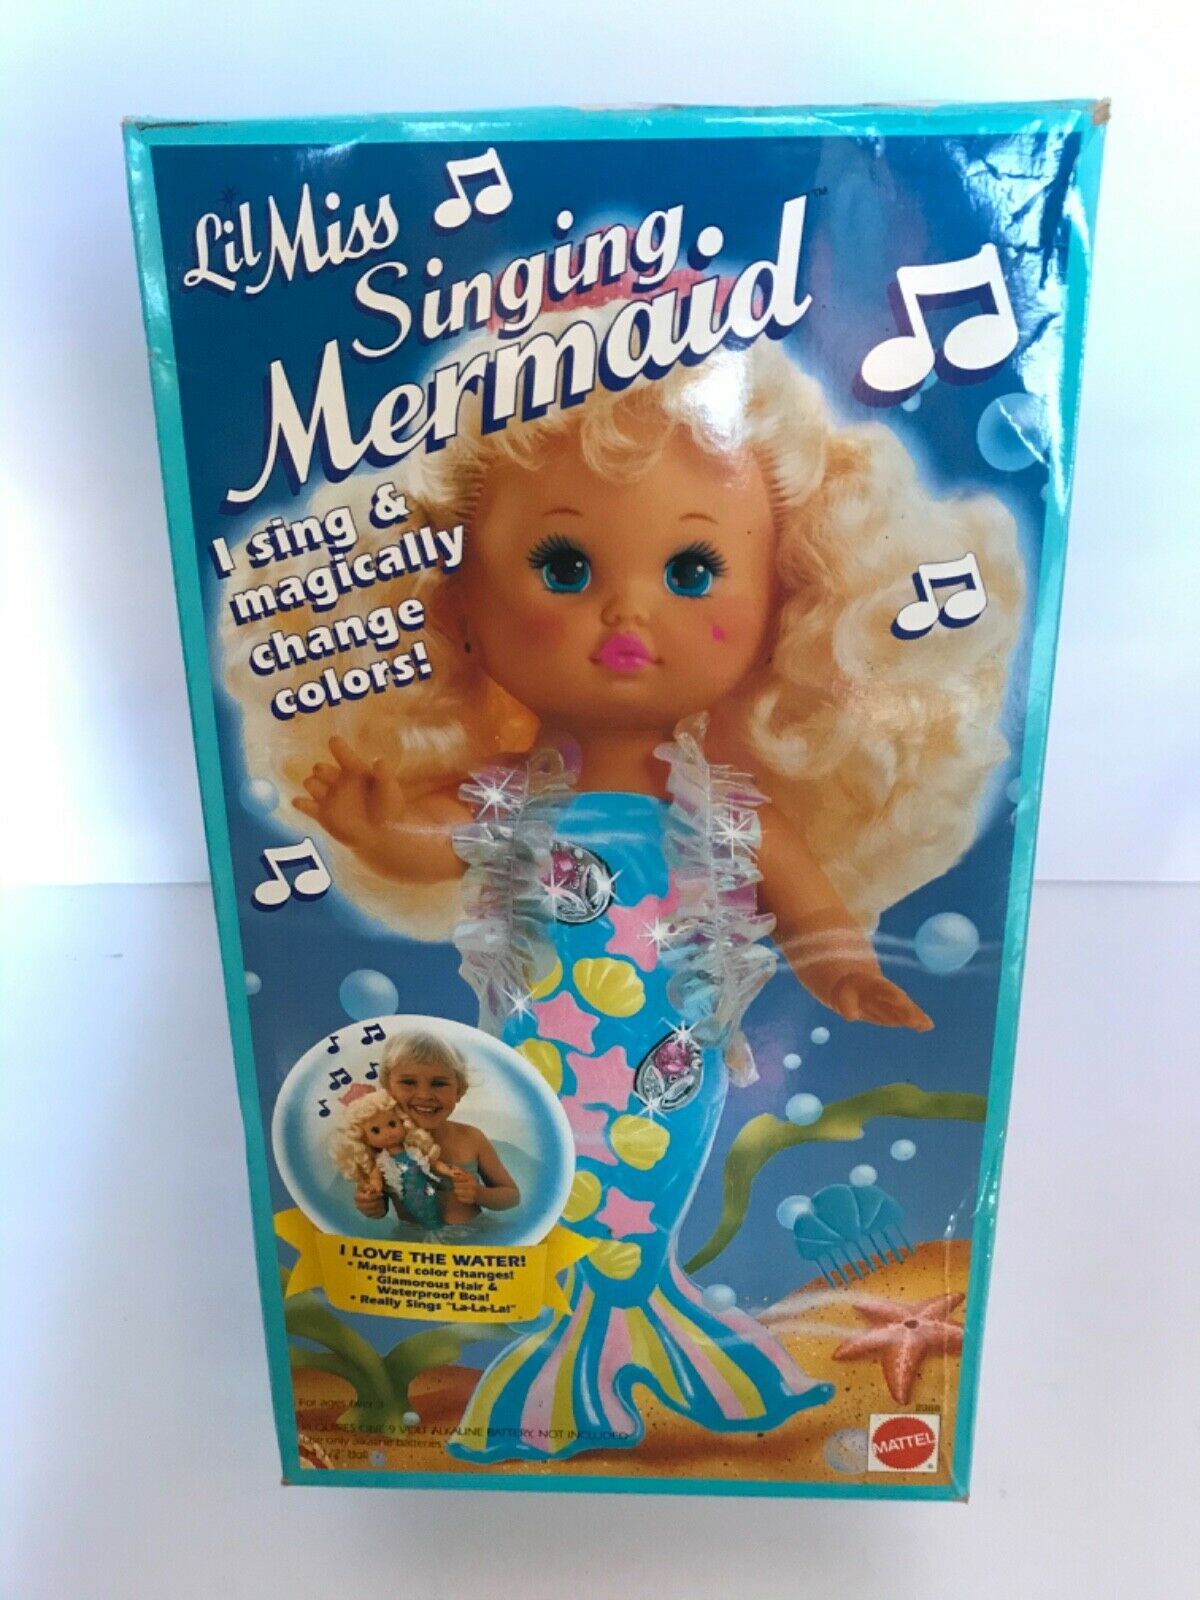 Vtg Lil Miss Singing Mermaid 33 Cm Doll Mattel 1991 Europe Mib Nrfb 2368 For Sale Online Ebay